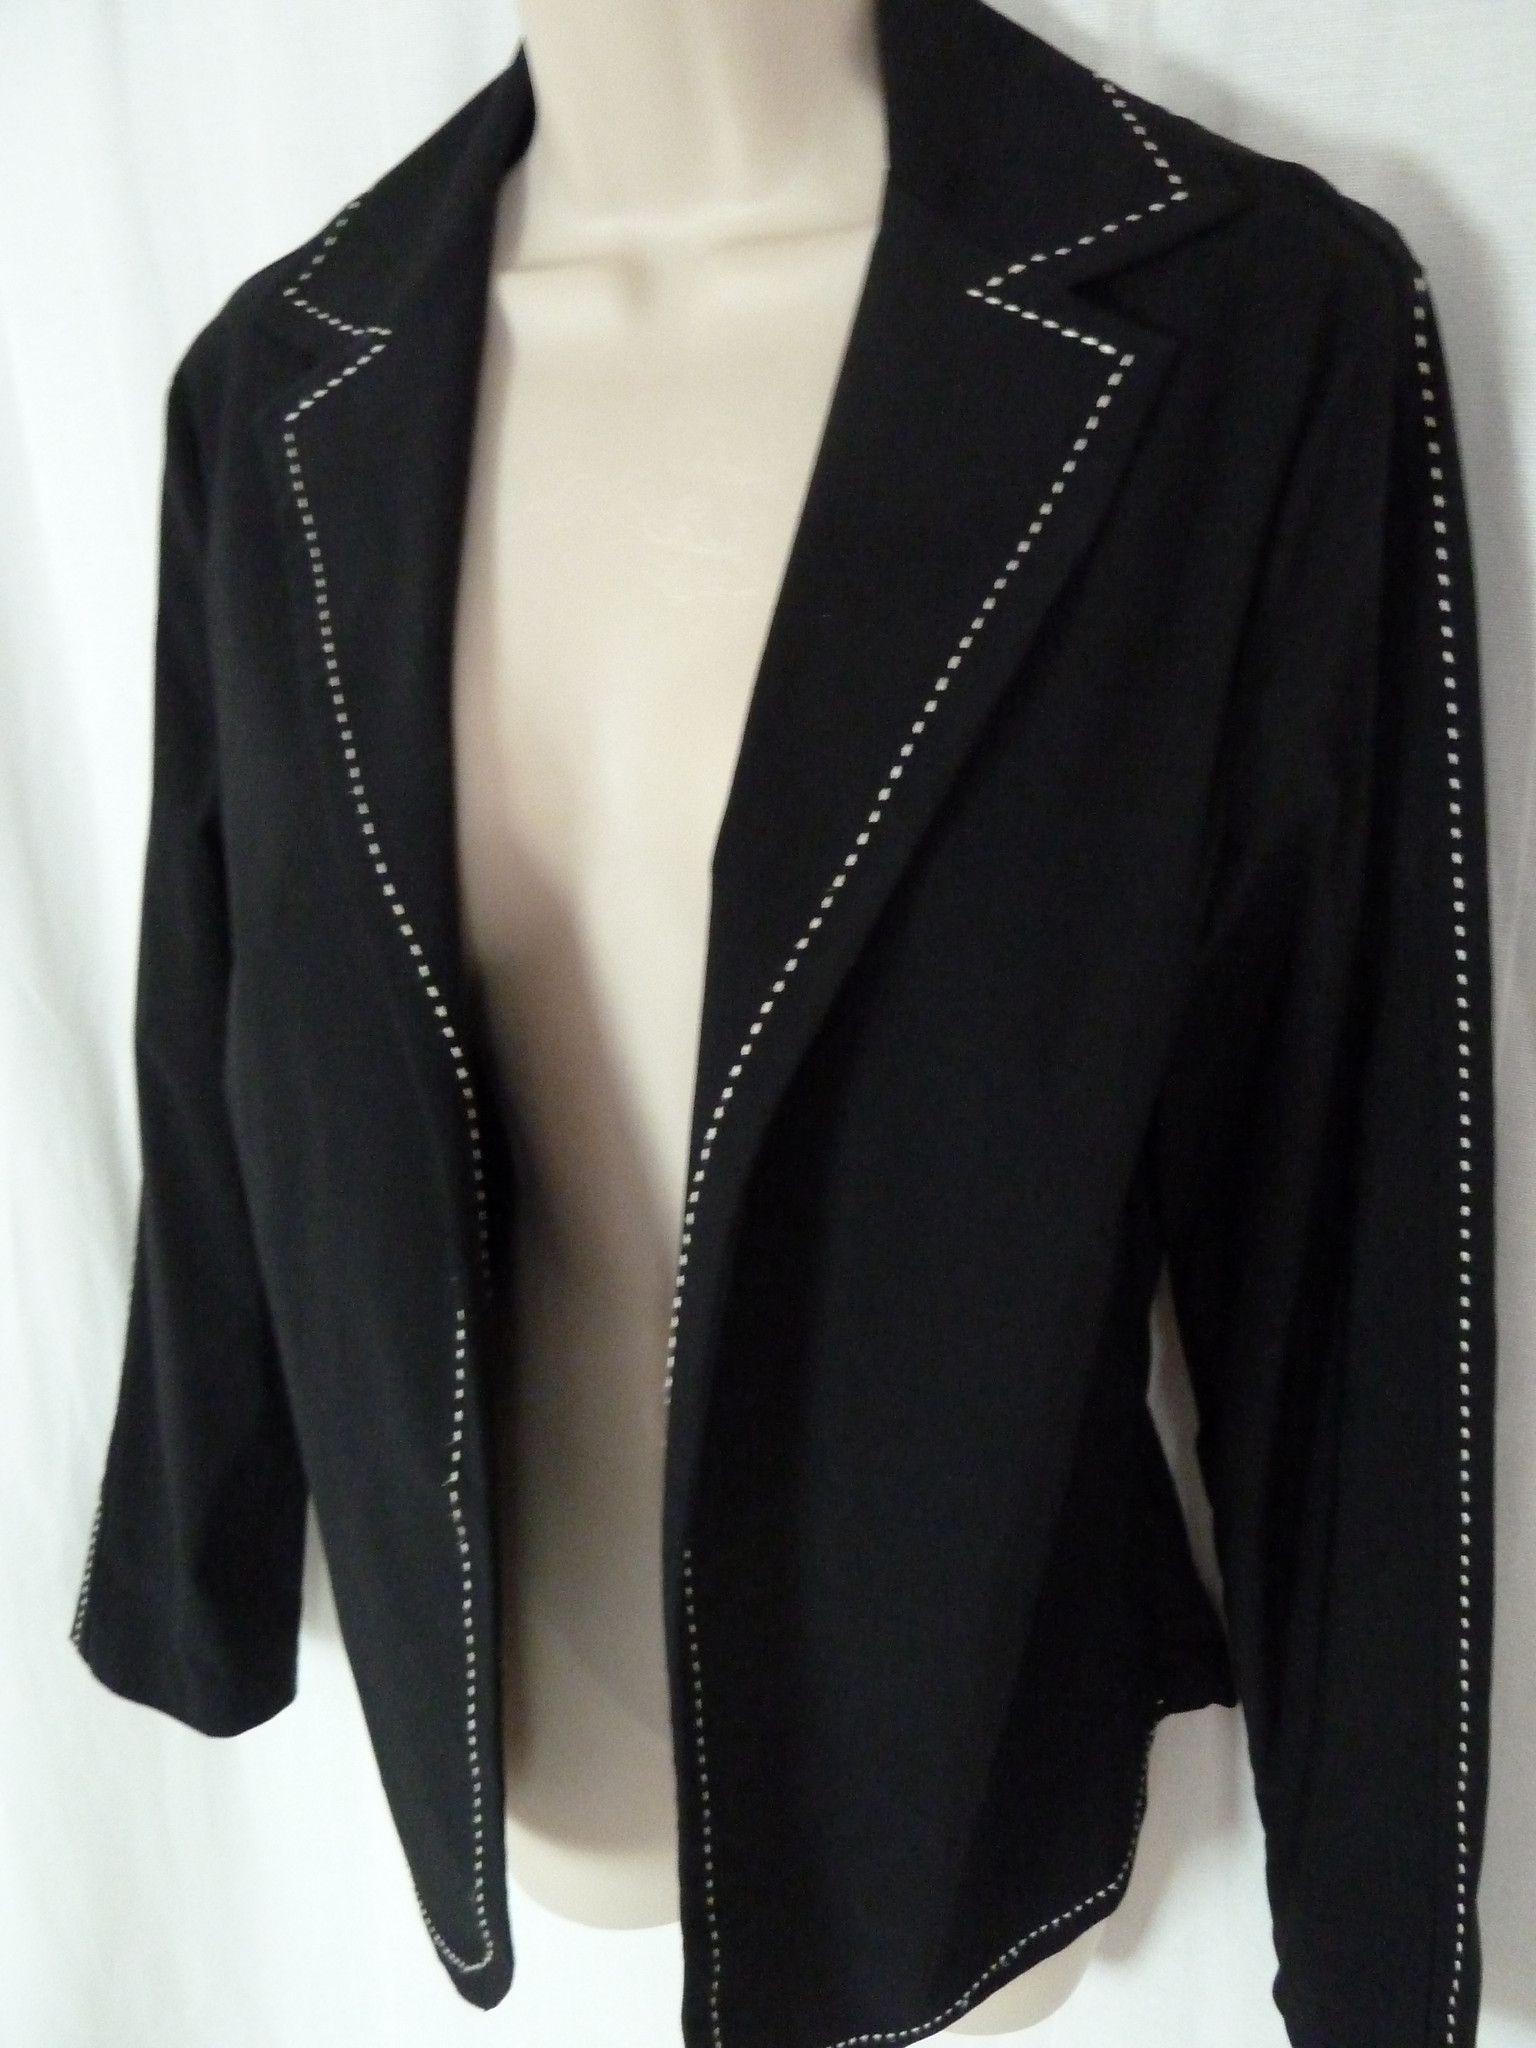 Awe Inspiring Cache Black Open Front Jacket 12 Blazer Ivory Stitch Trim Andrewgaddart Wooden Chair Designs For Living Room Andrewgaddartcom